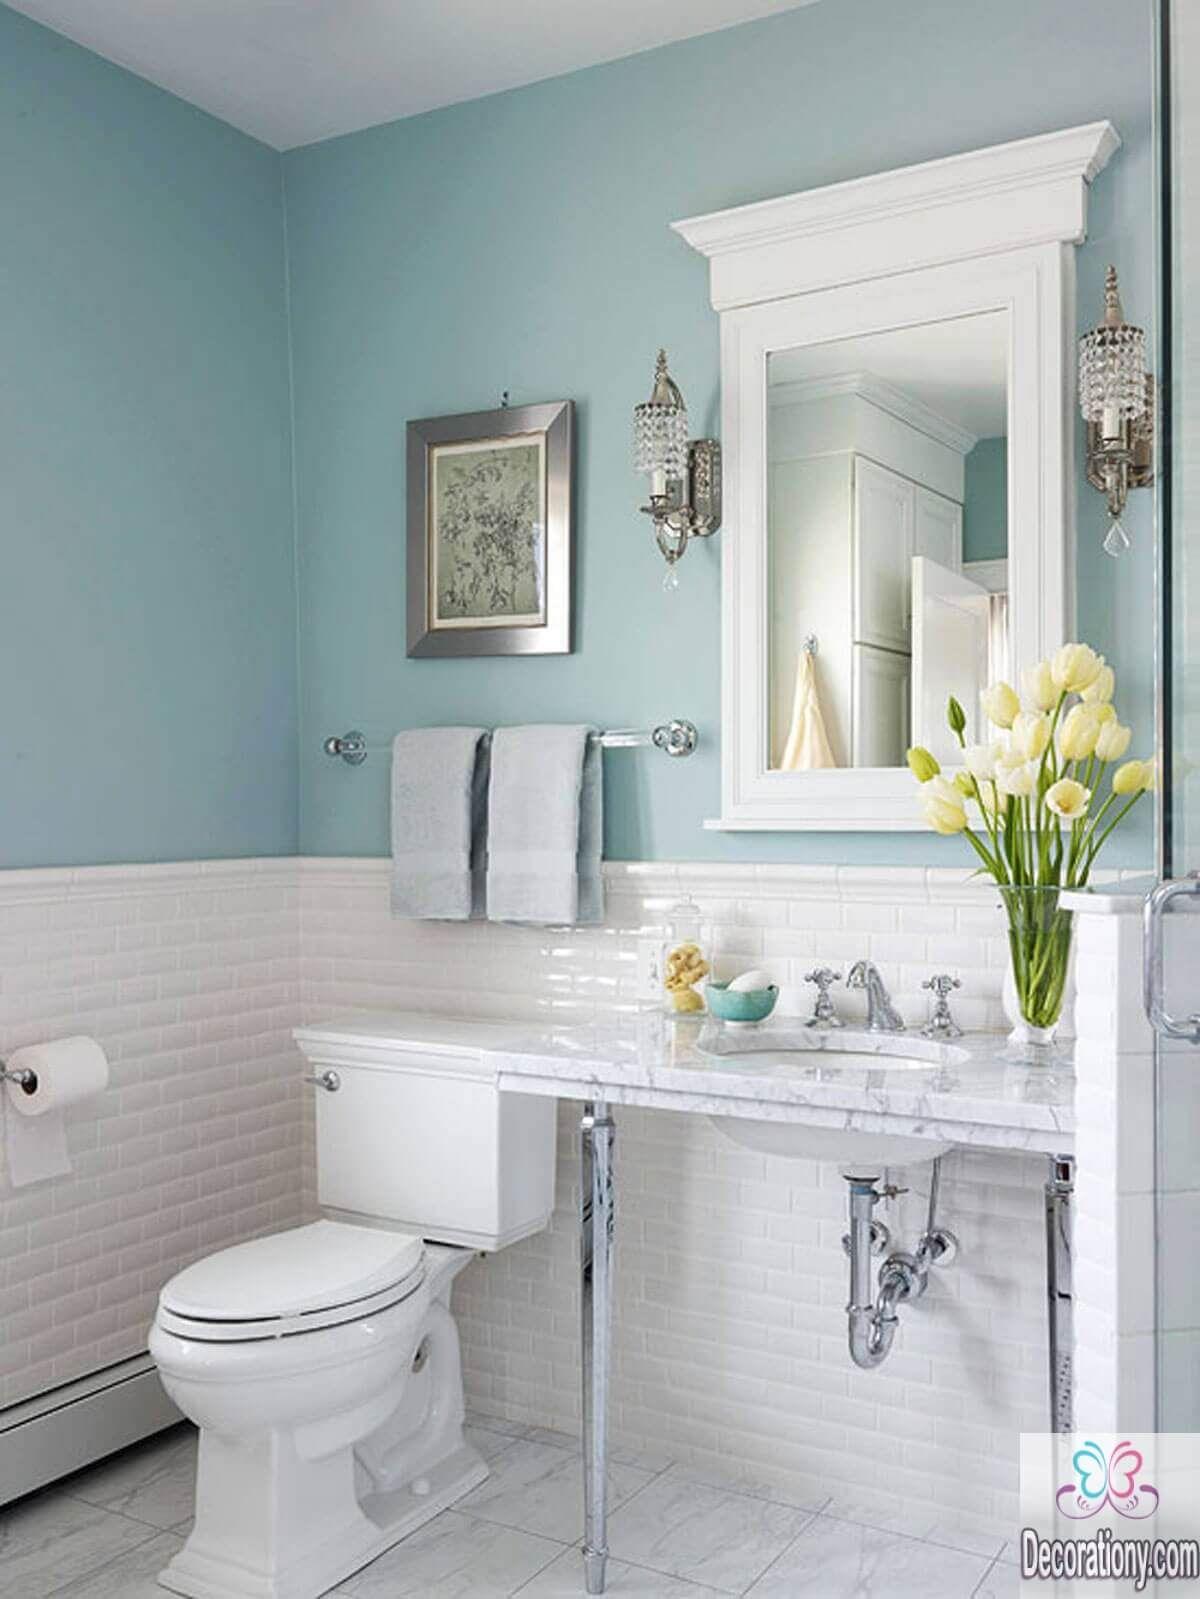 15+ Small White Beautiful Bathroom Remodel Ideas | Small bathroom ...